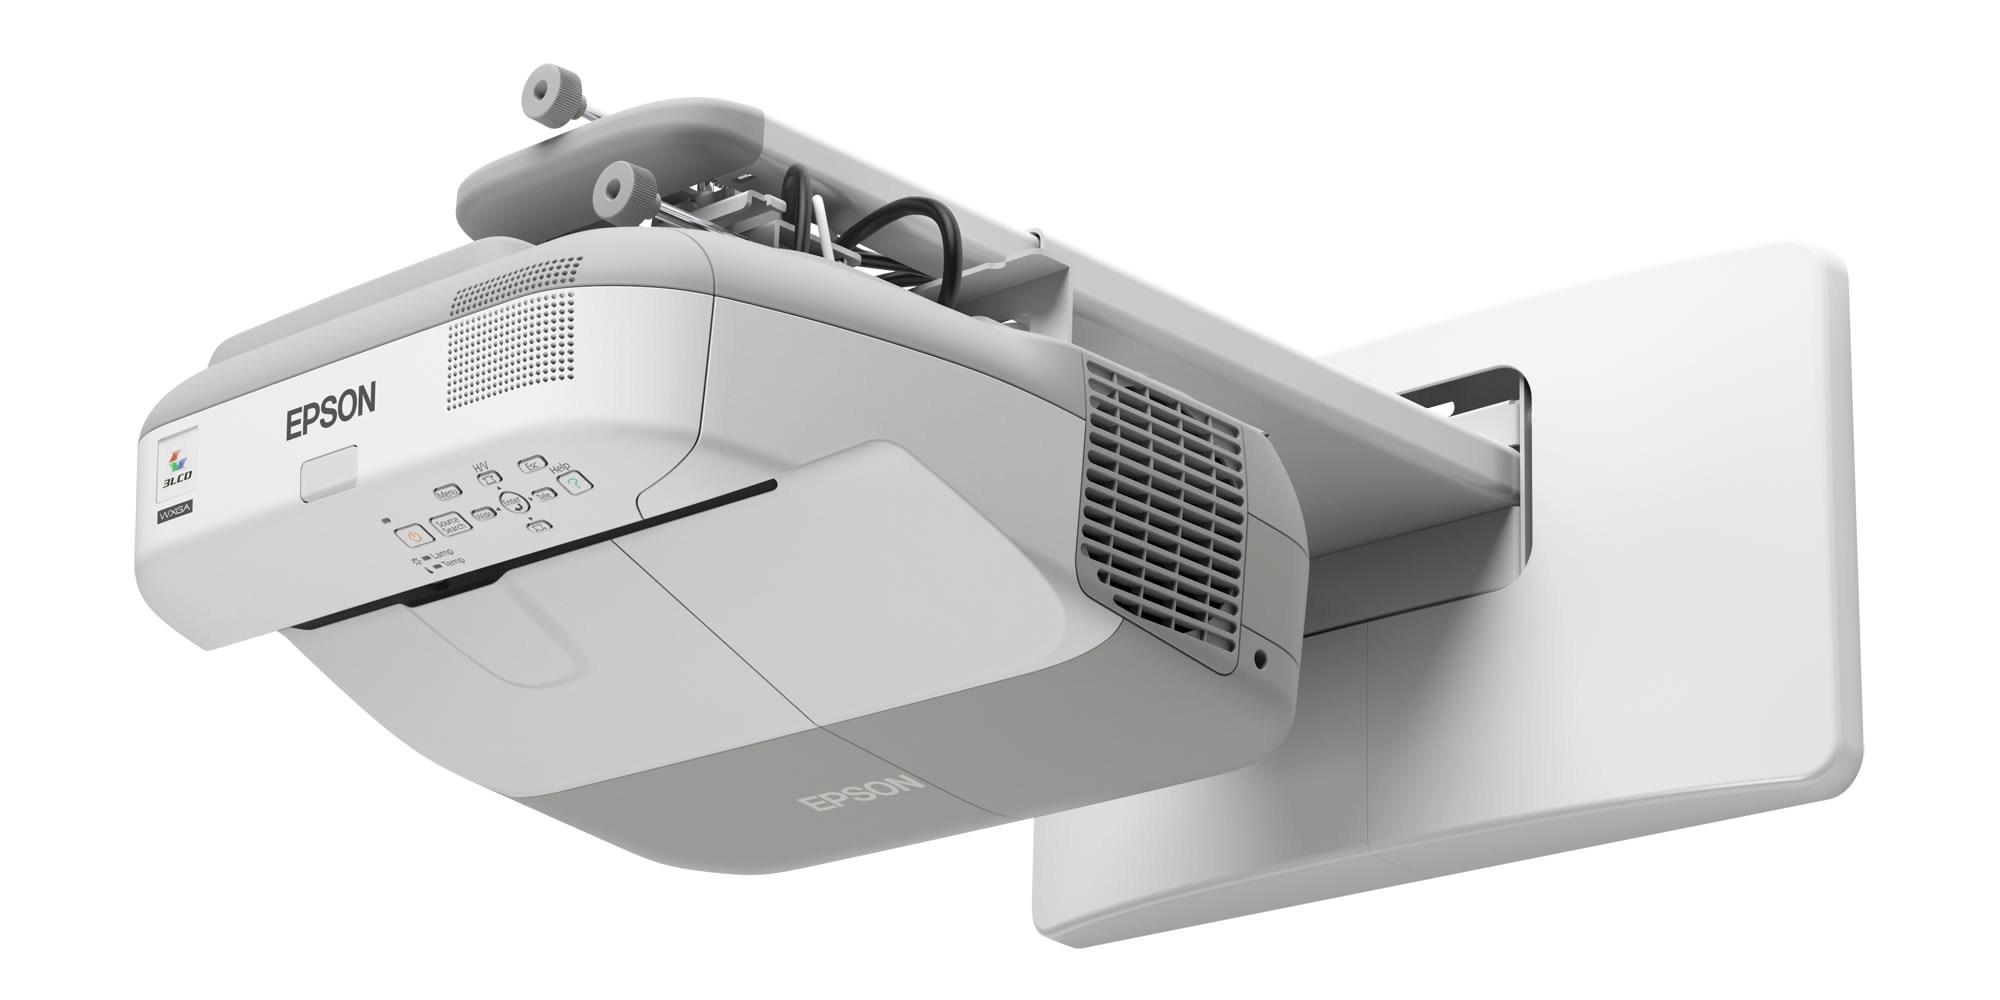 Epson EB 585WI Interactive Projector